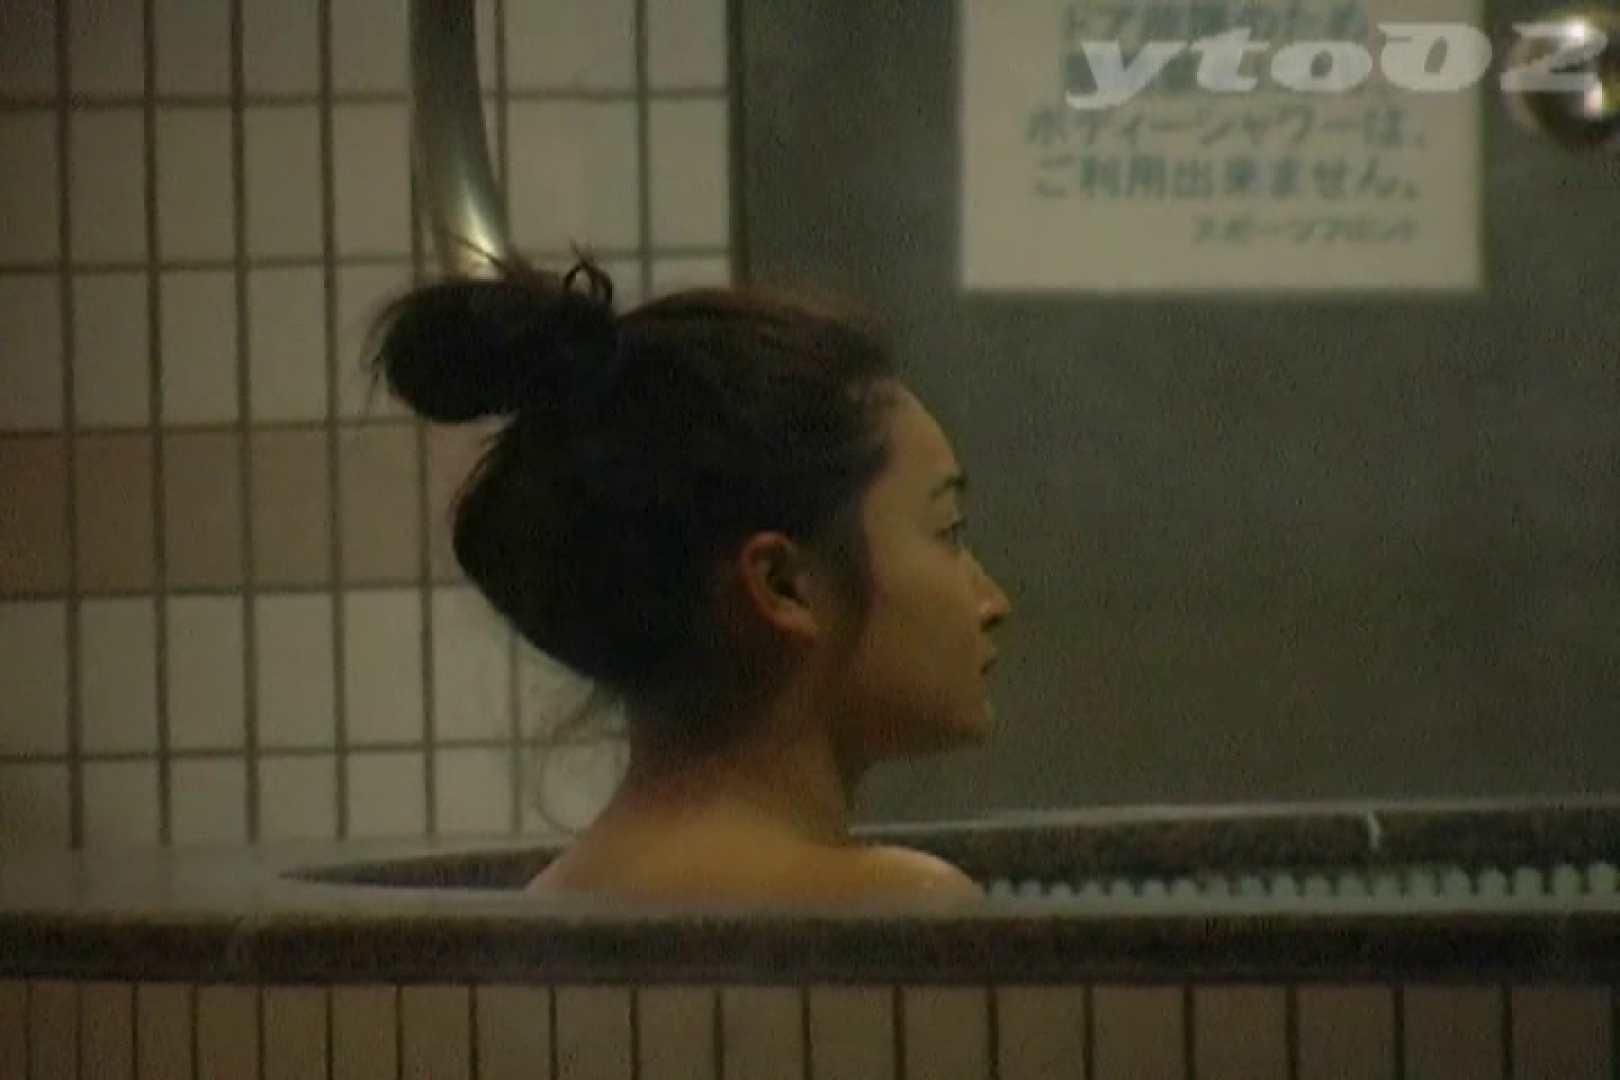 ▲復活限定▲合宿ホテル女風呂盗撮 Vol.11 入浴  79pic 72